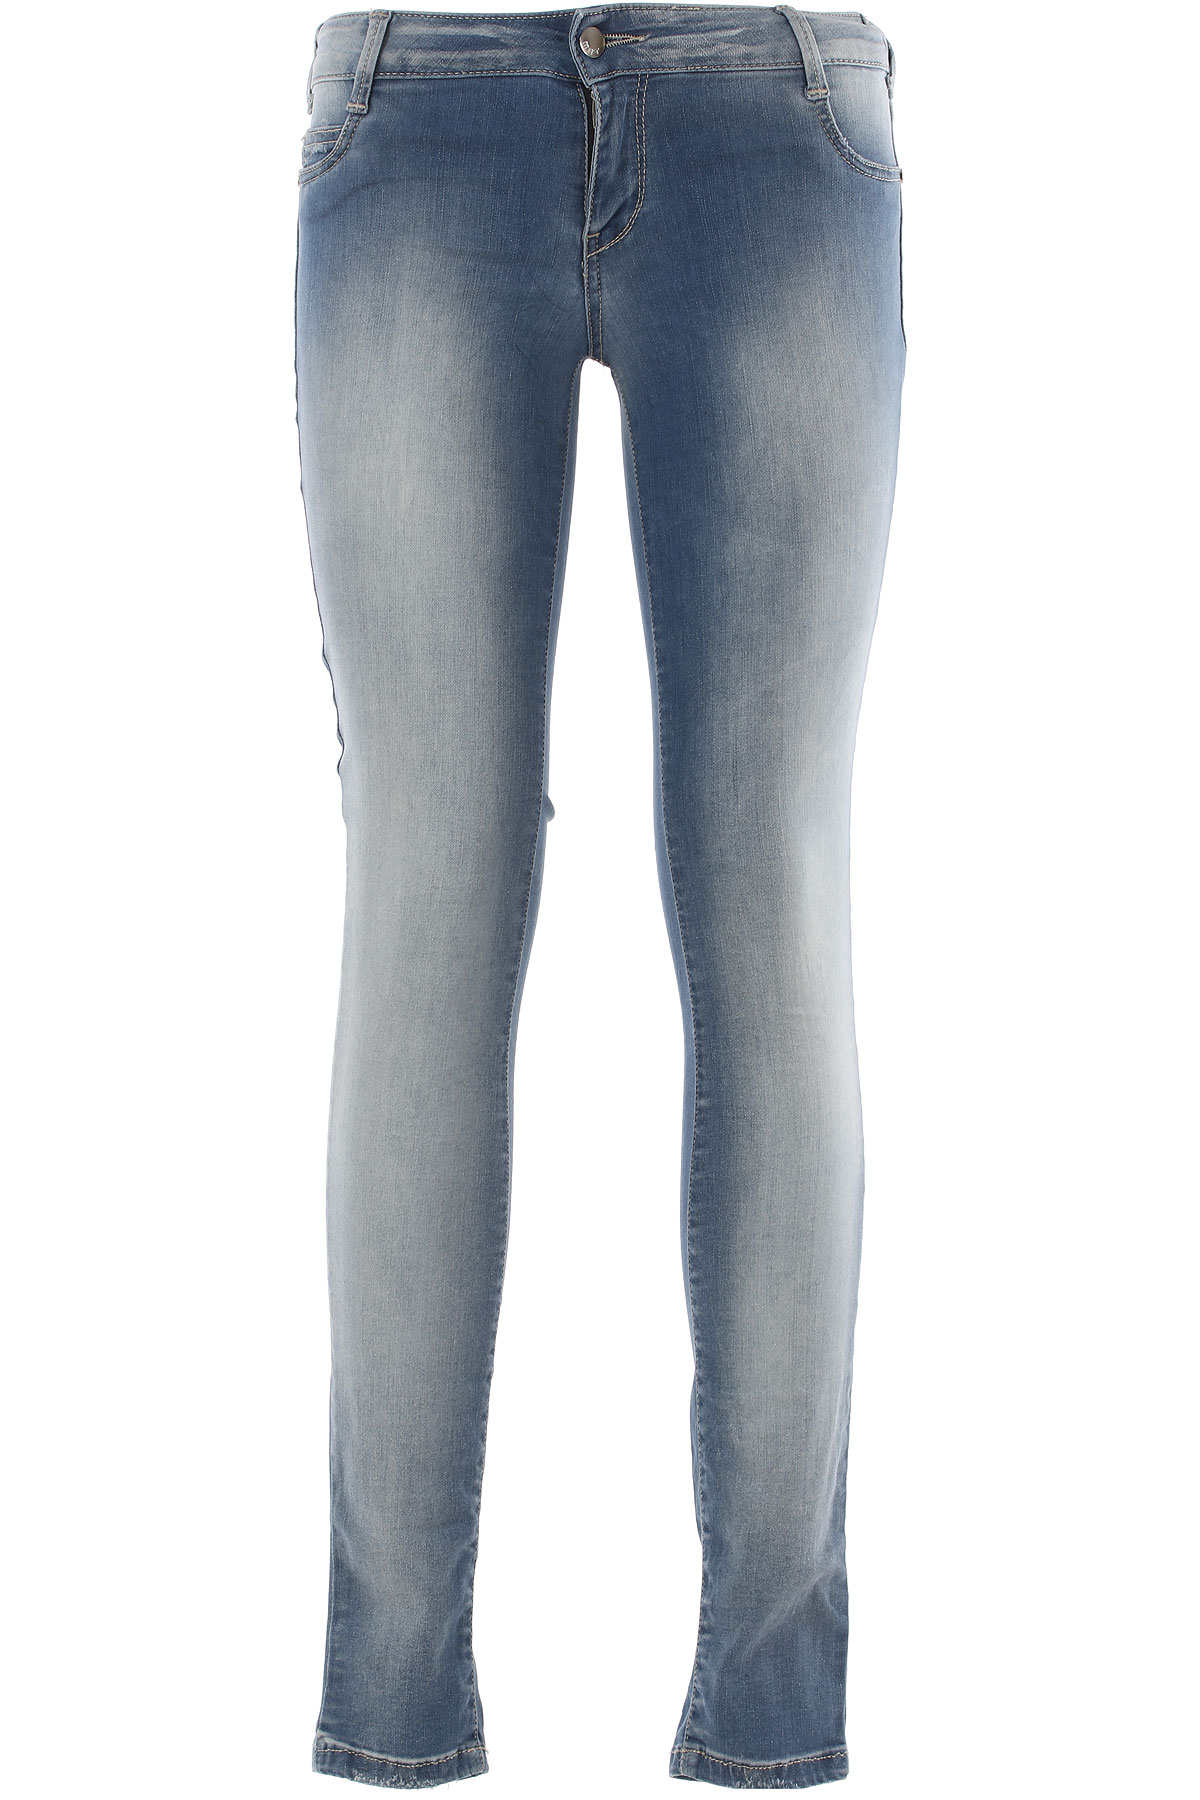 Image of Met Jeans On Sale in Outlet, Denim Blue, Cotton, 2017, 25 29